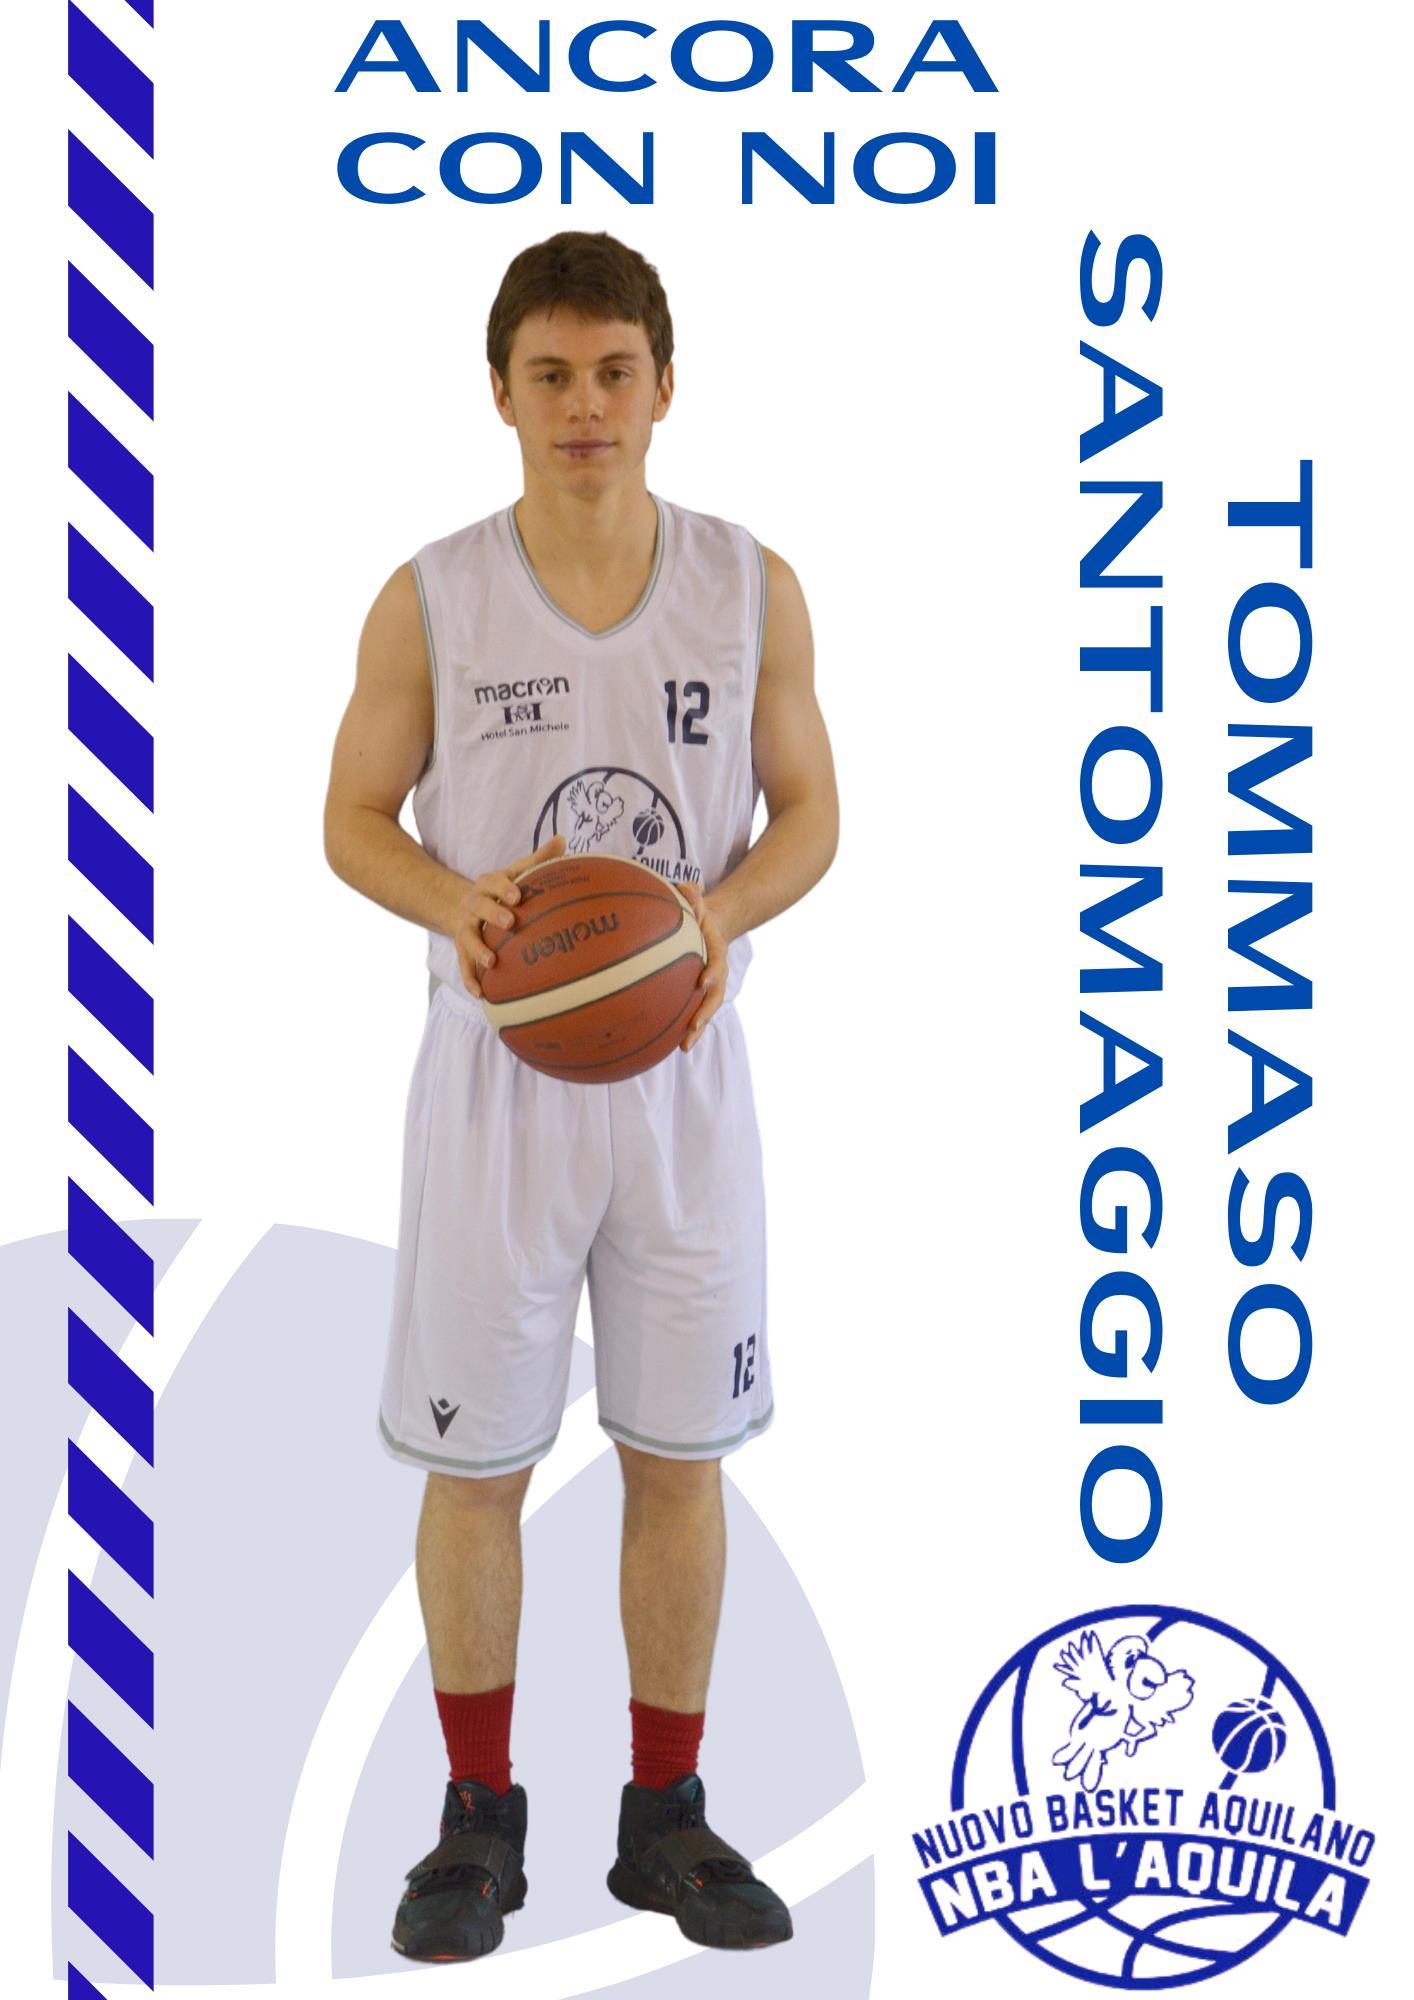 Tommaso Santomaggio